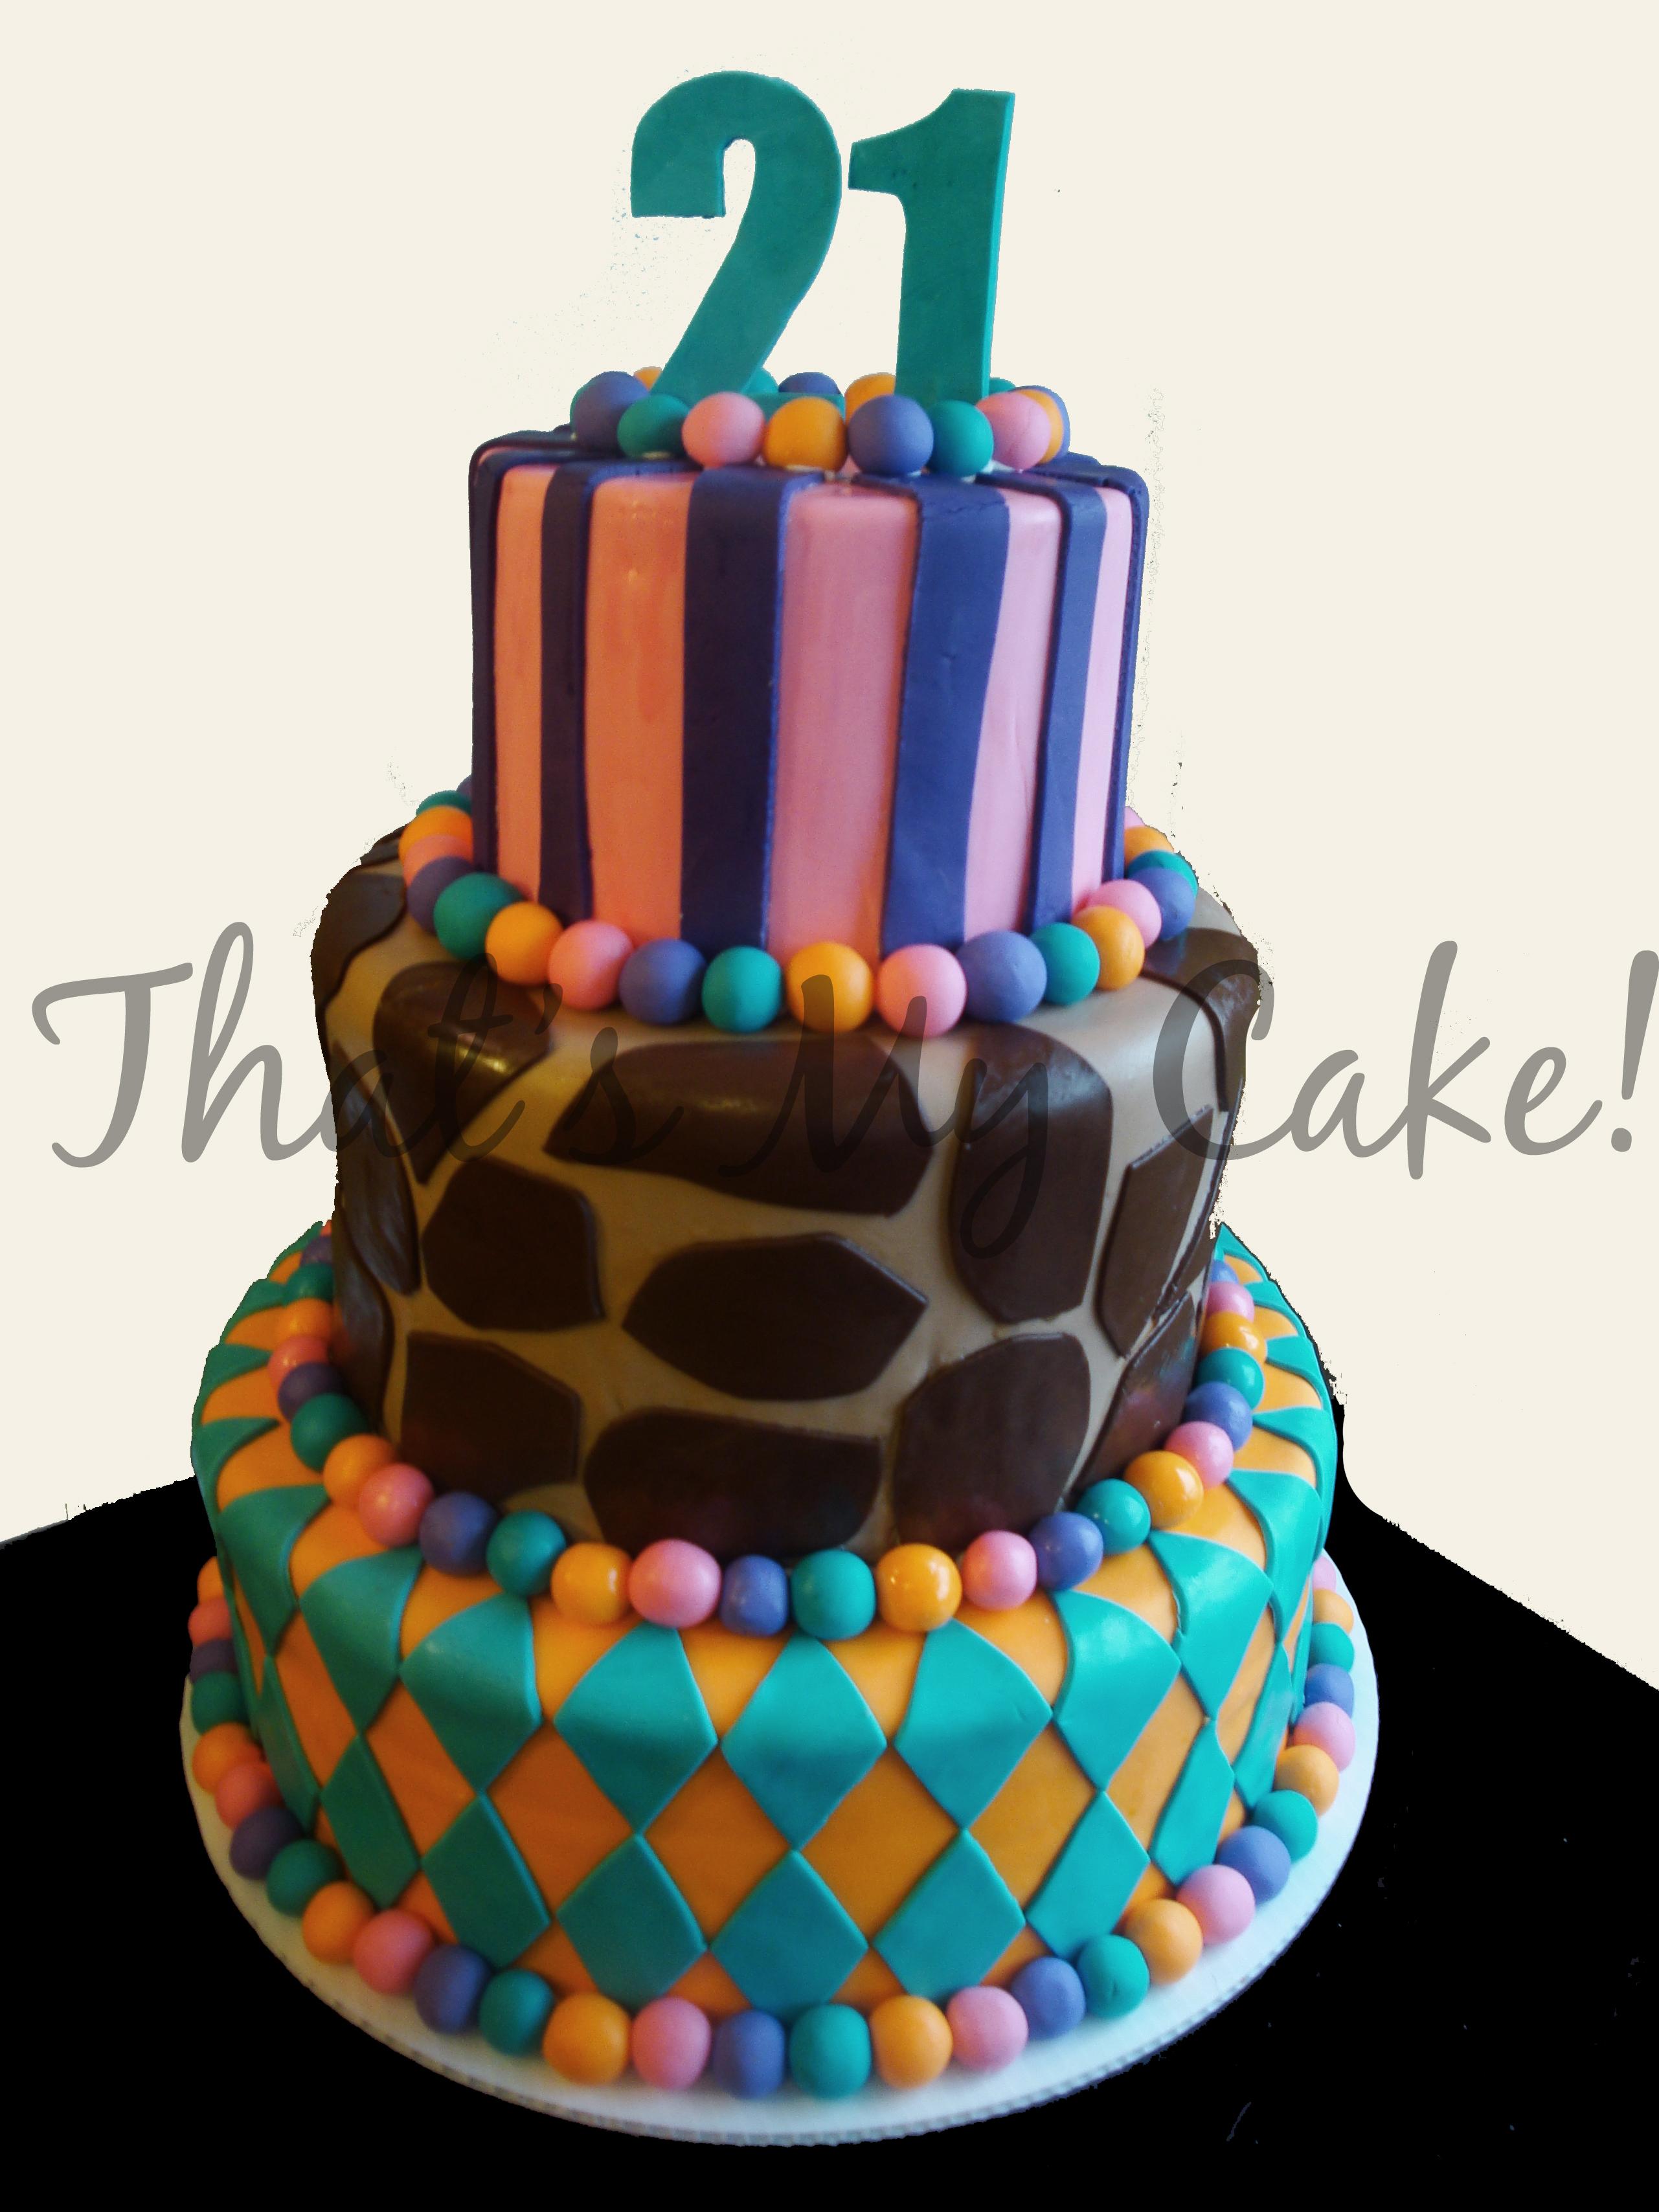 Superb Whimsical 21St Birthday Cake Thats My Cake Personalised Birthday Cards Arneslily Jamesorg